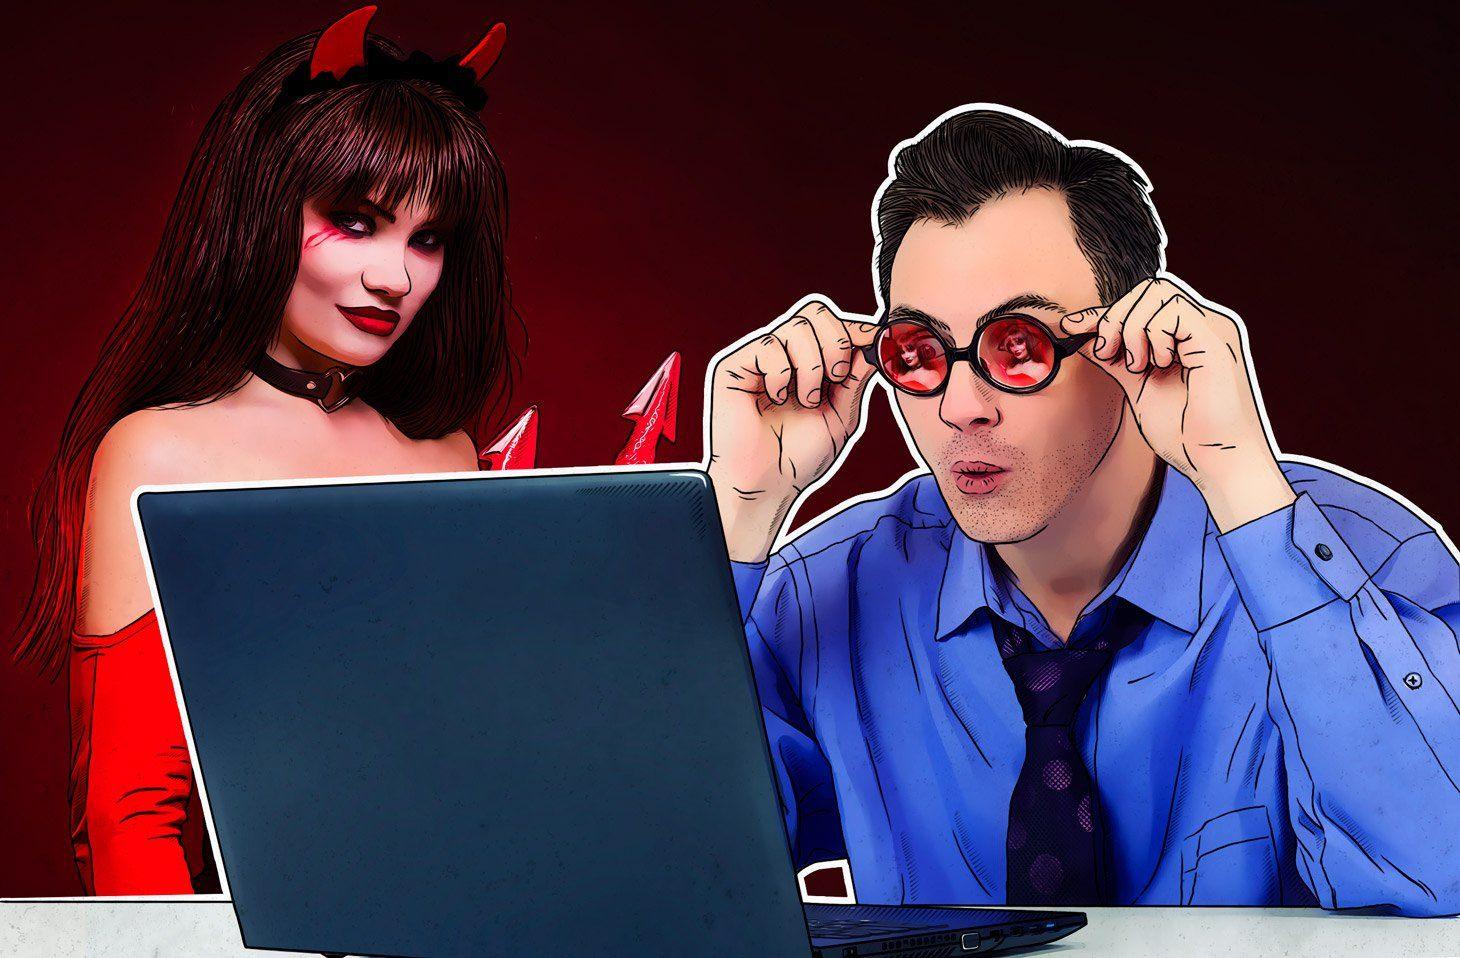 Легальные онлайн порносайты